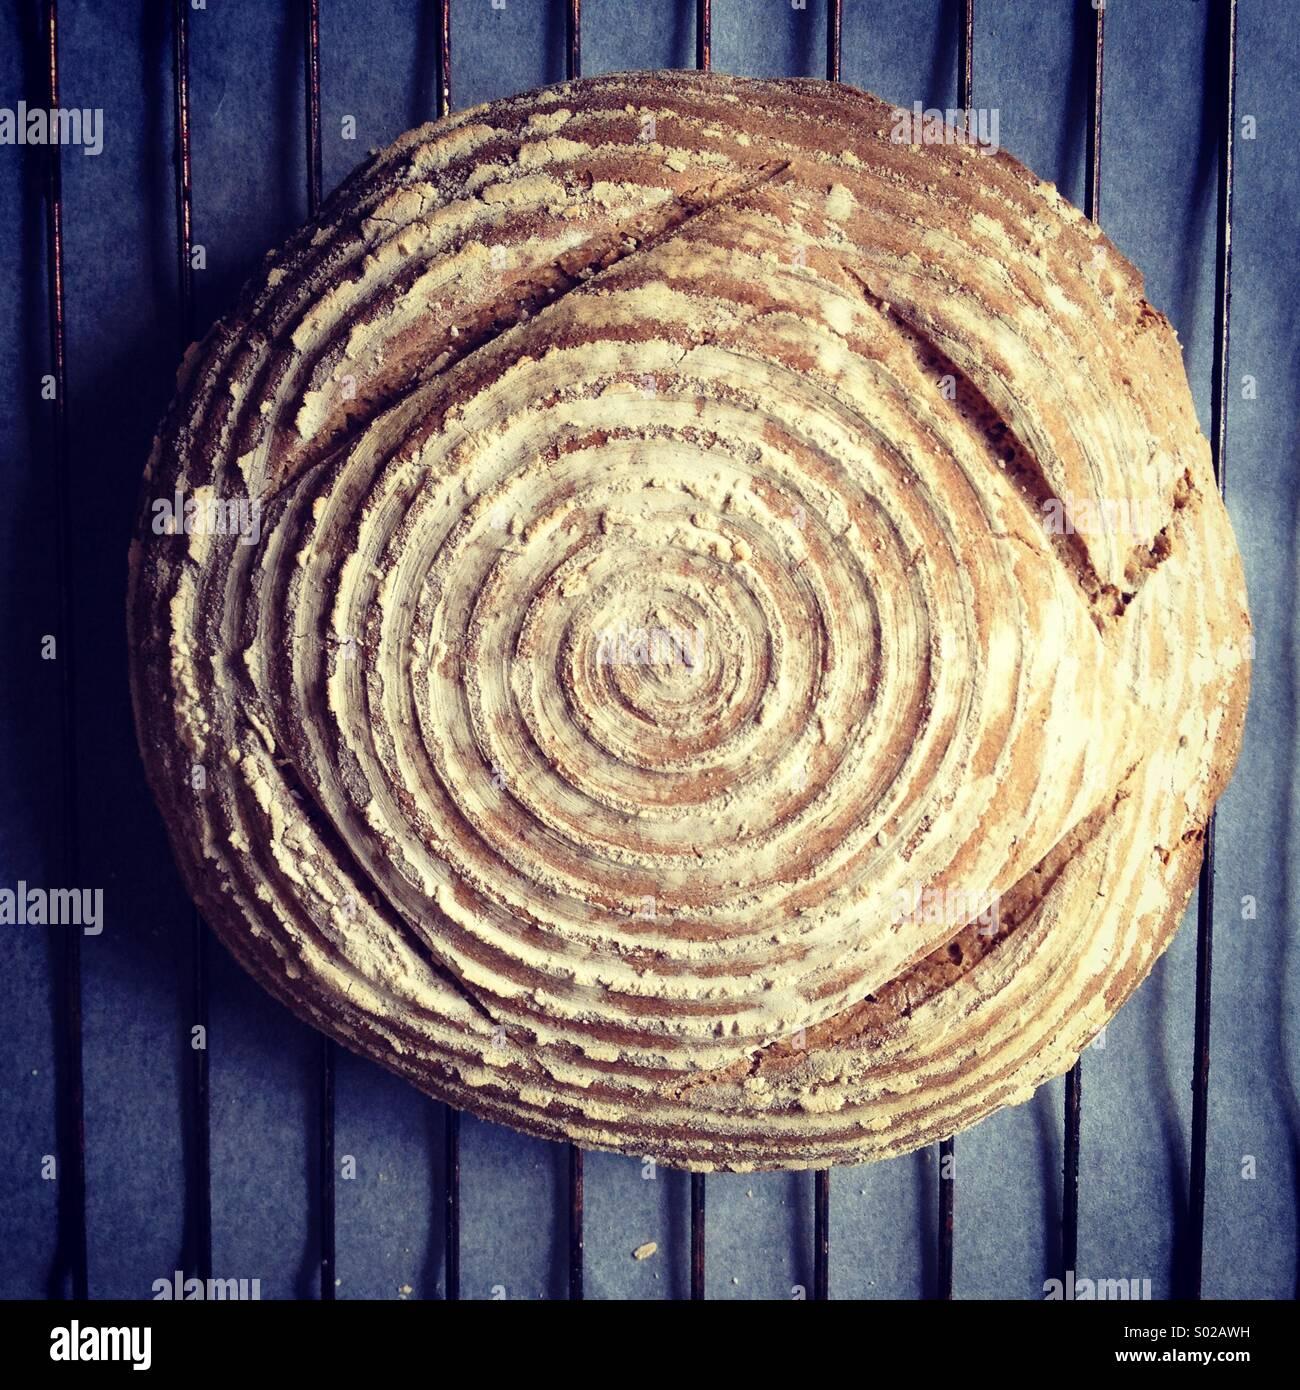 Pane a lievitazione naturale Immagini Stock